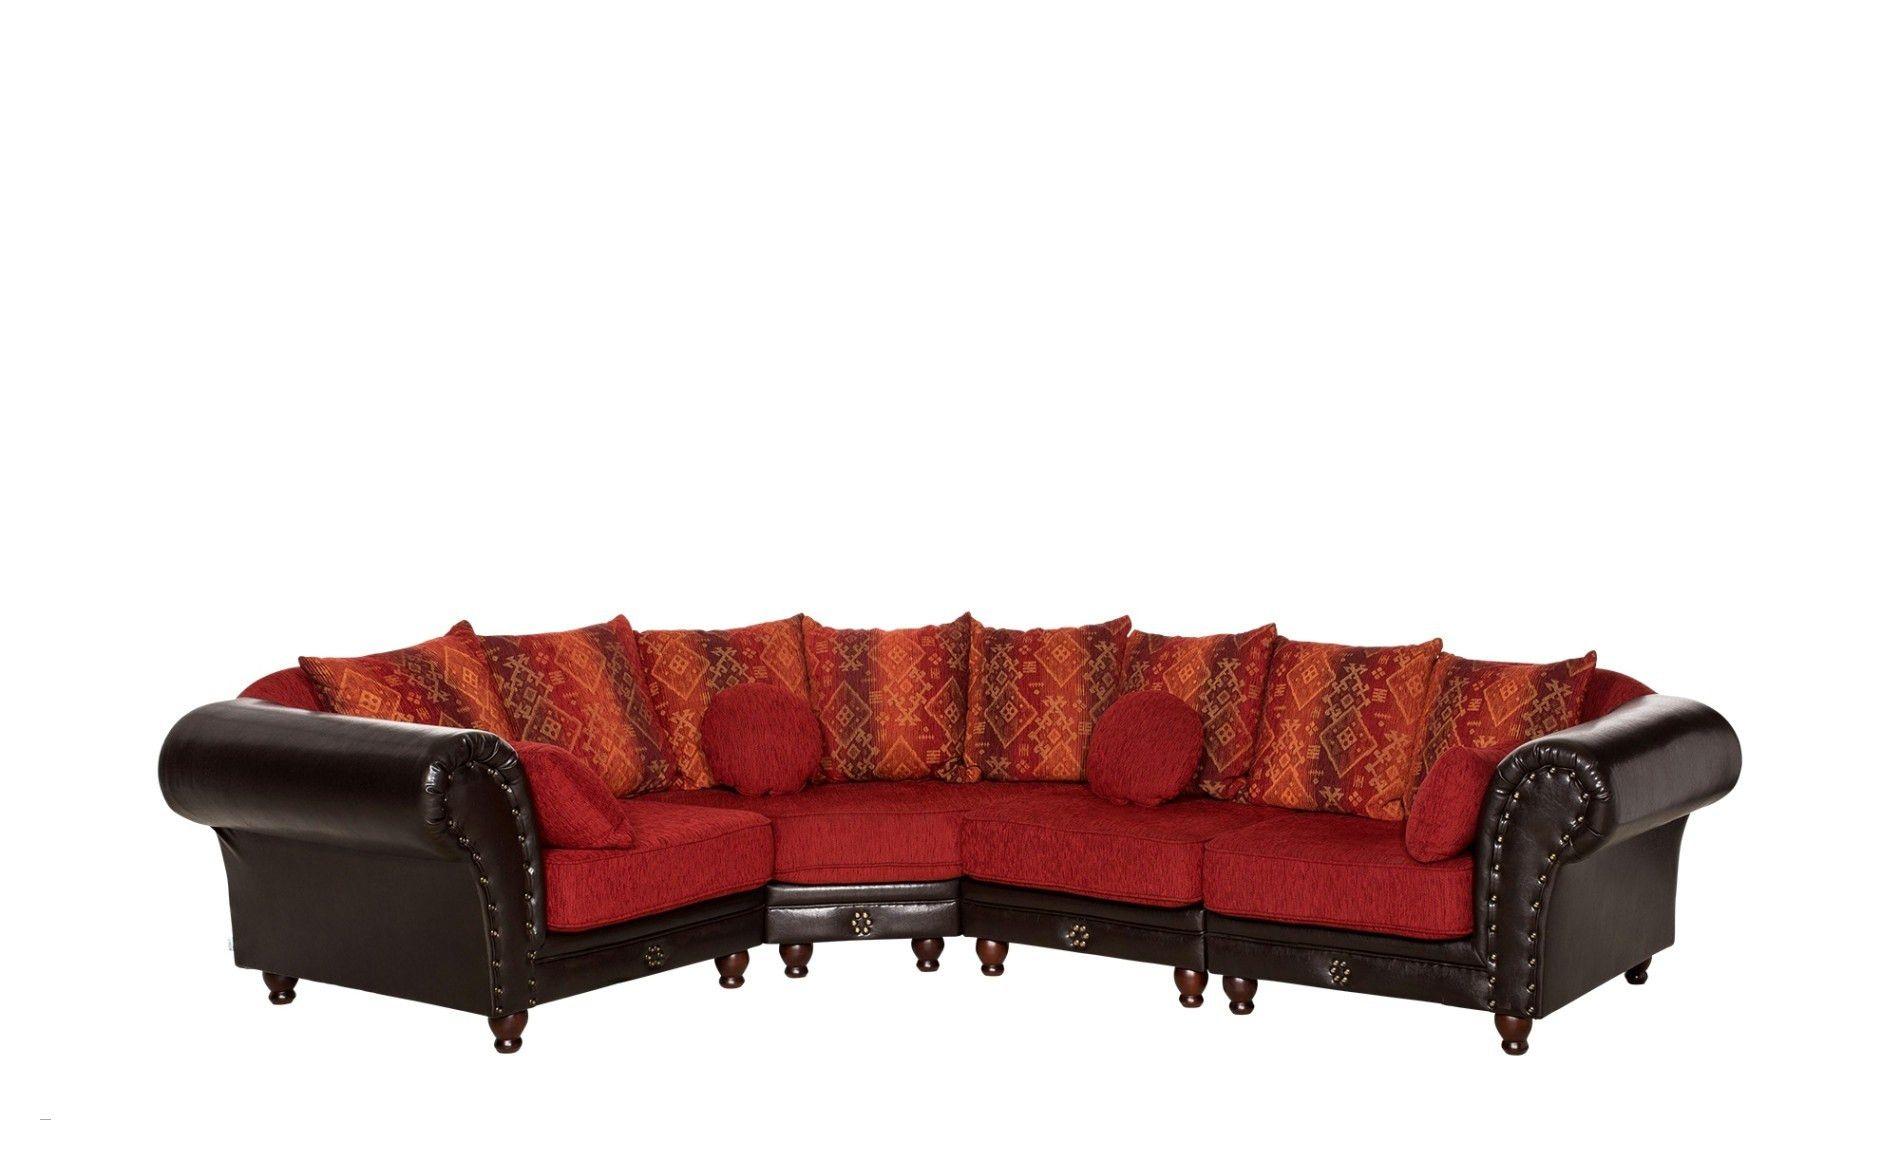 Atemberaubend Couchgarnitur Mit Sessel Home Decor Decor Love Seat